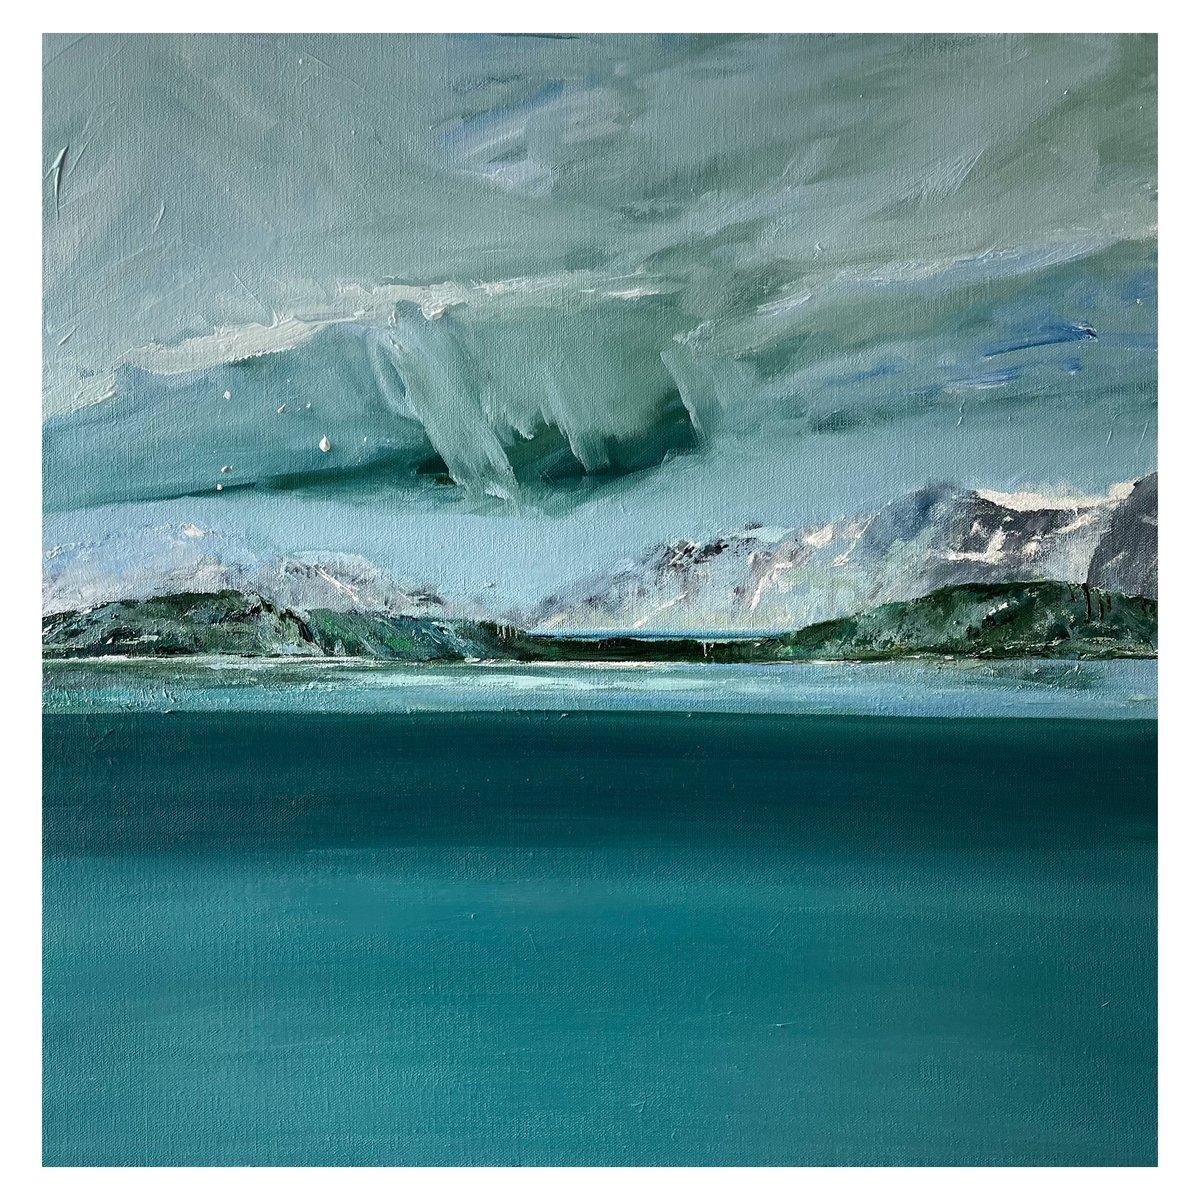 Image of 'Scandinavia' 2021 oil on canvas